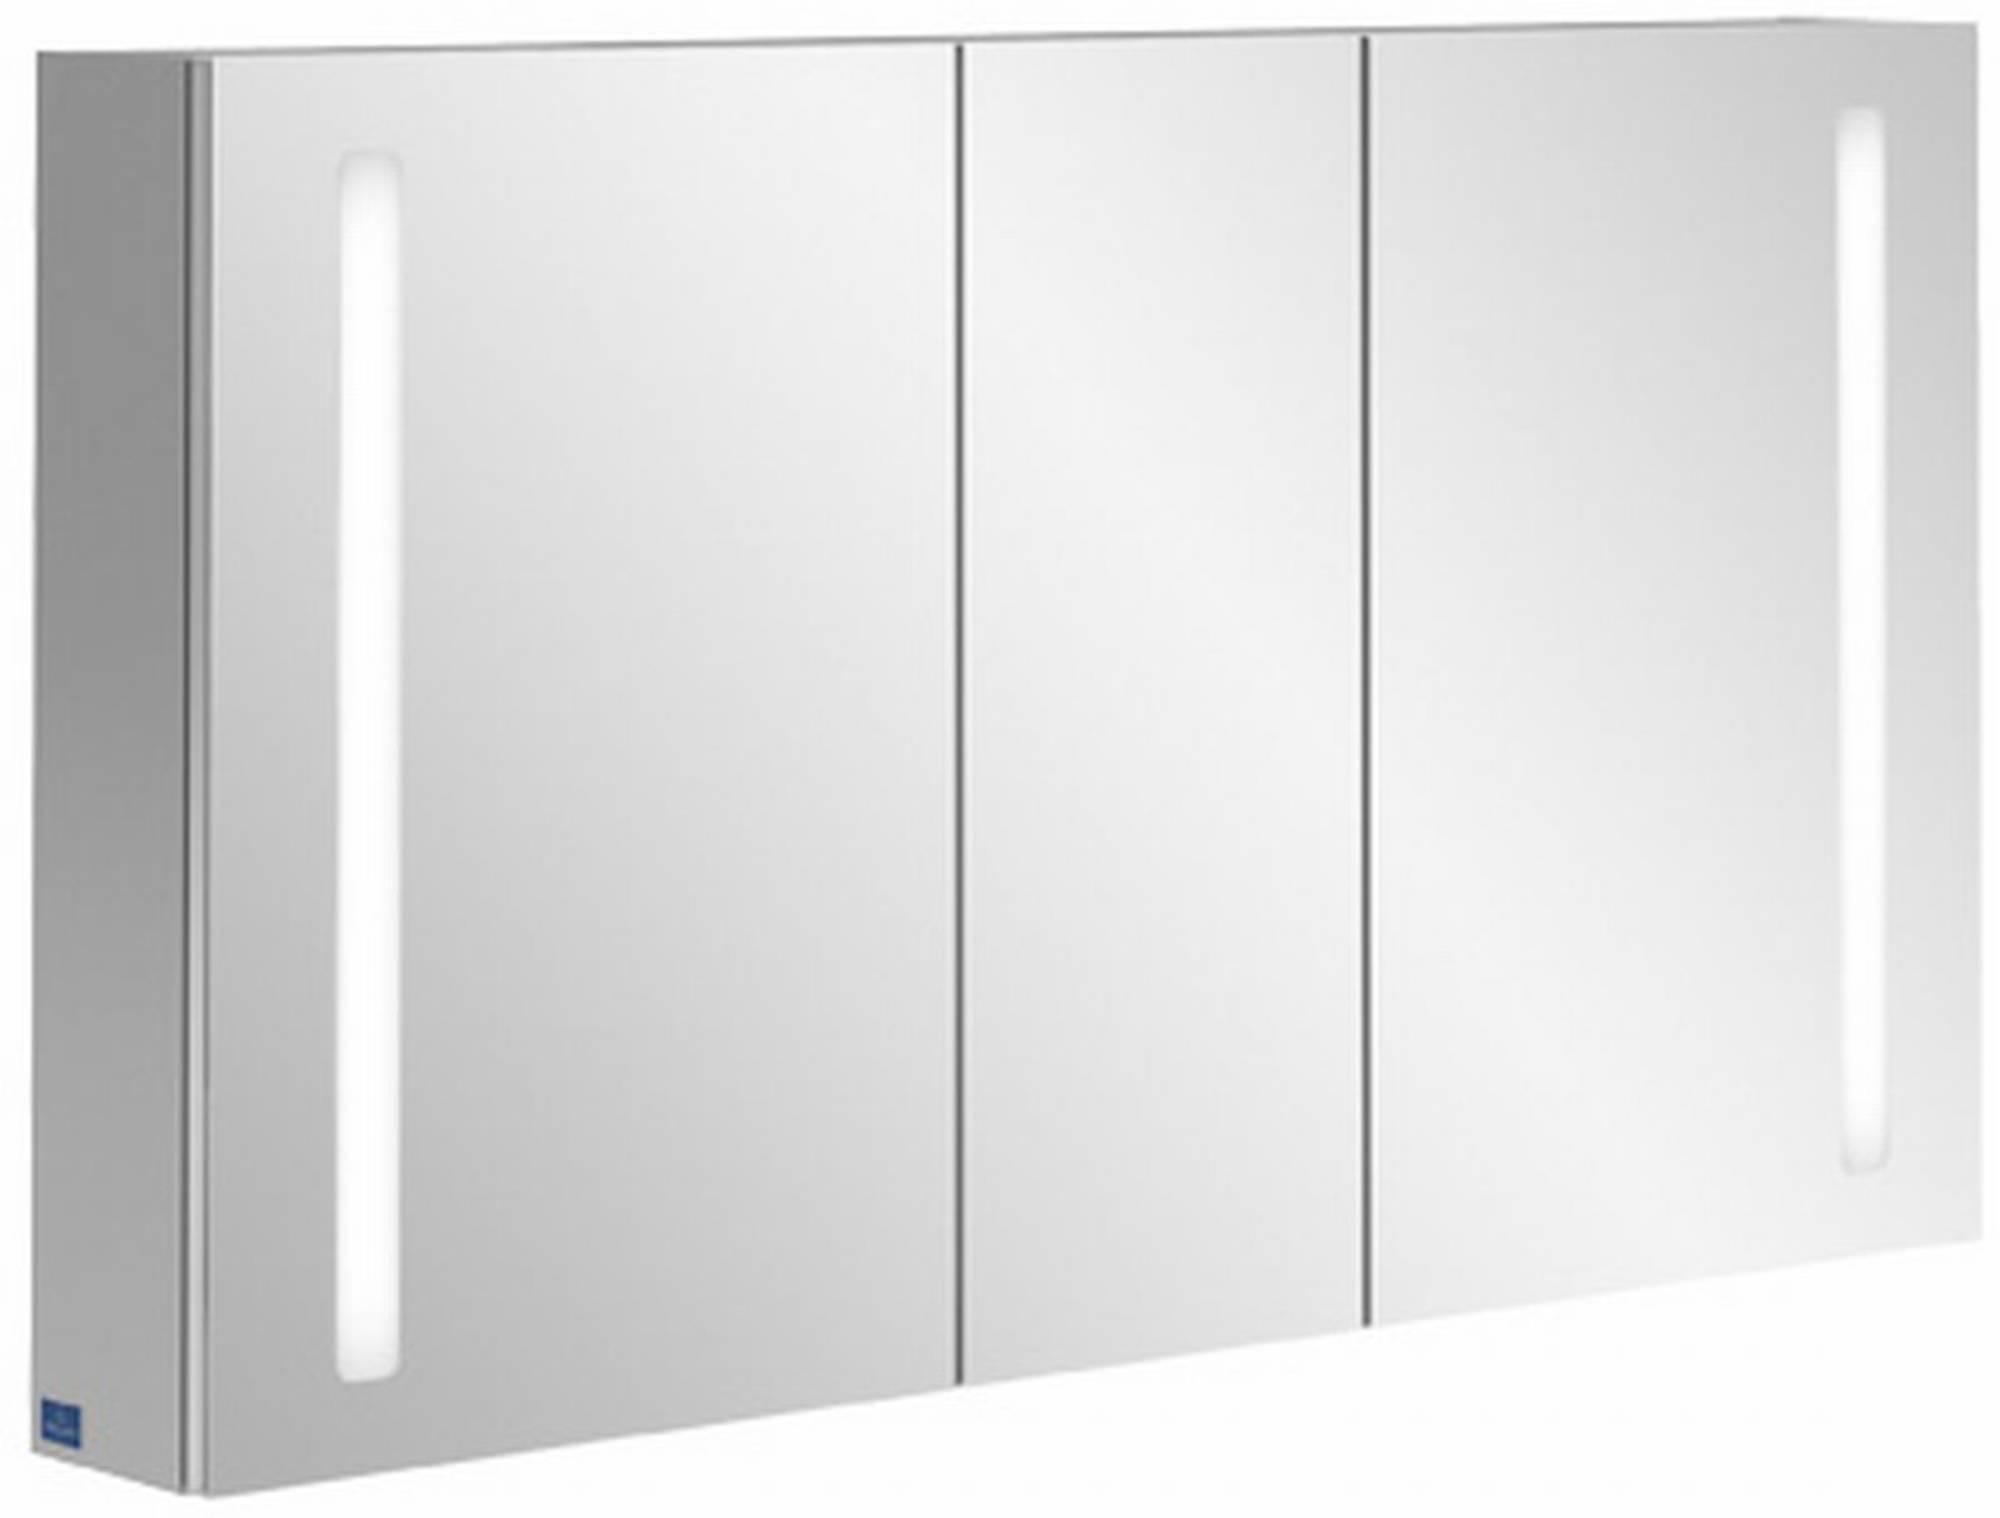 Villeroy & boch My view 14 spiegelkast 120x75 cm, 3 deuren en led verlichting